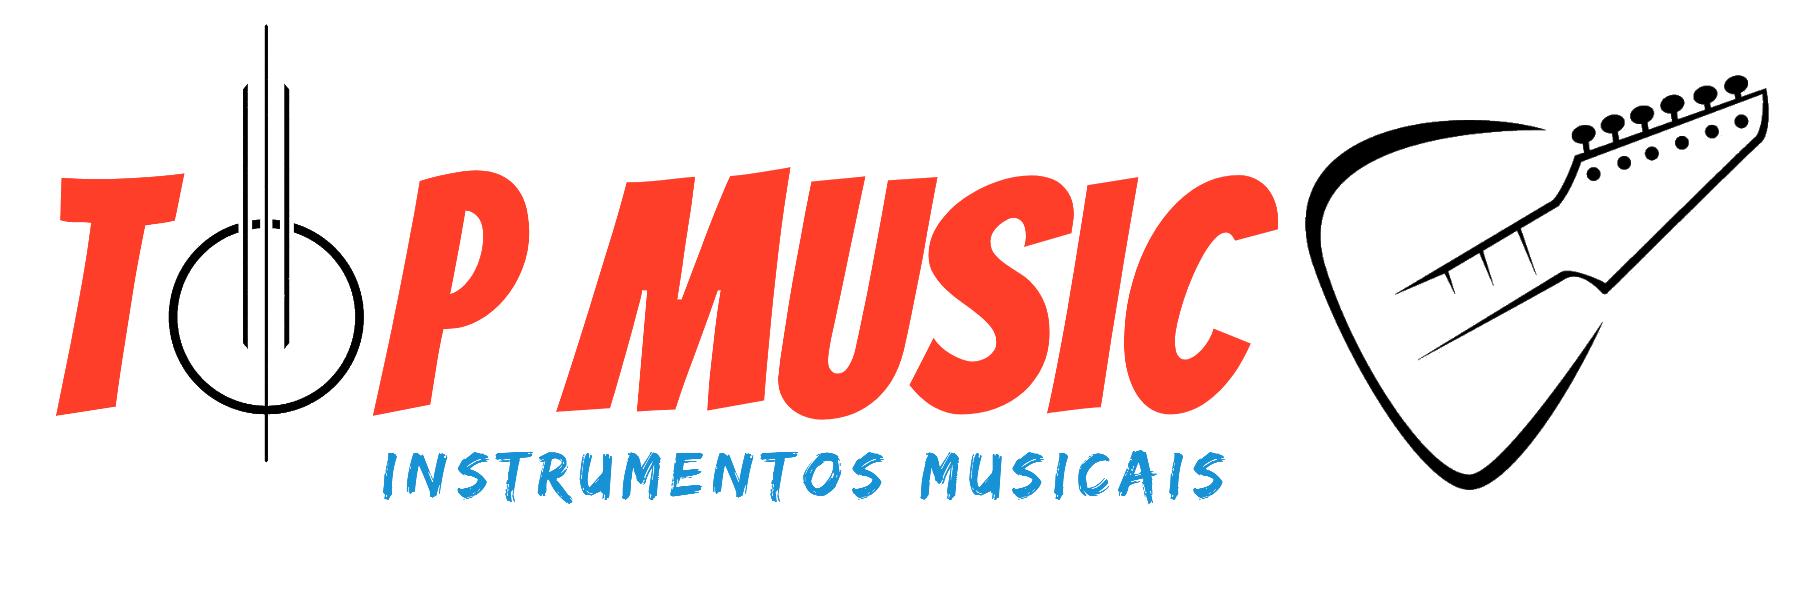 Top Music Instrumentos Musicais